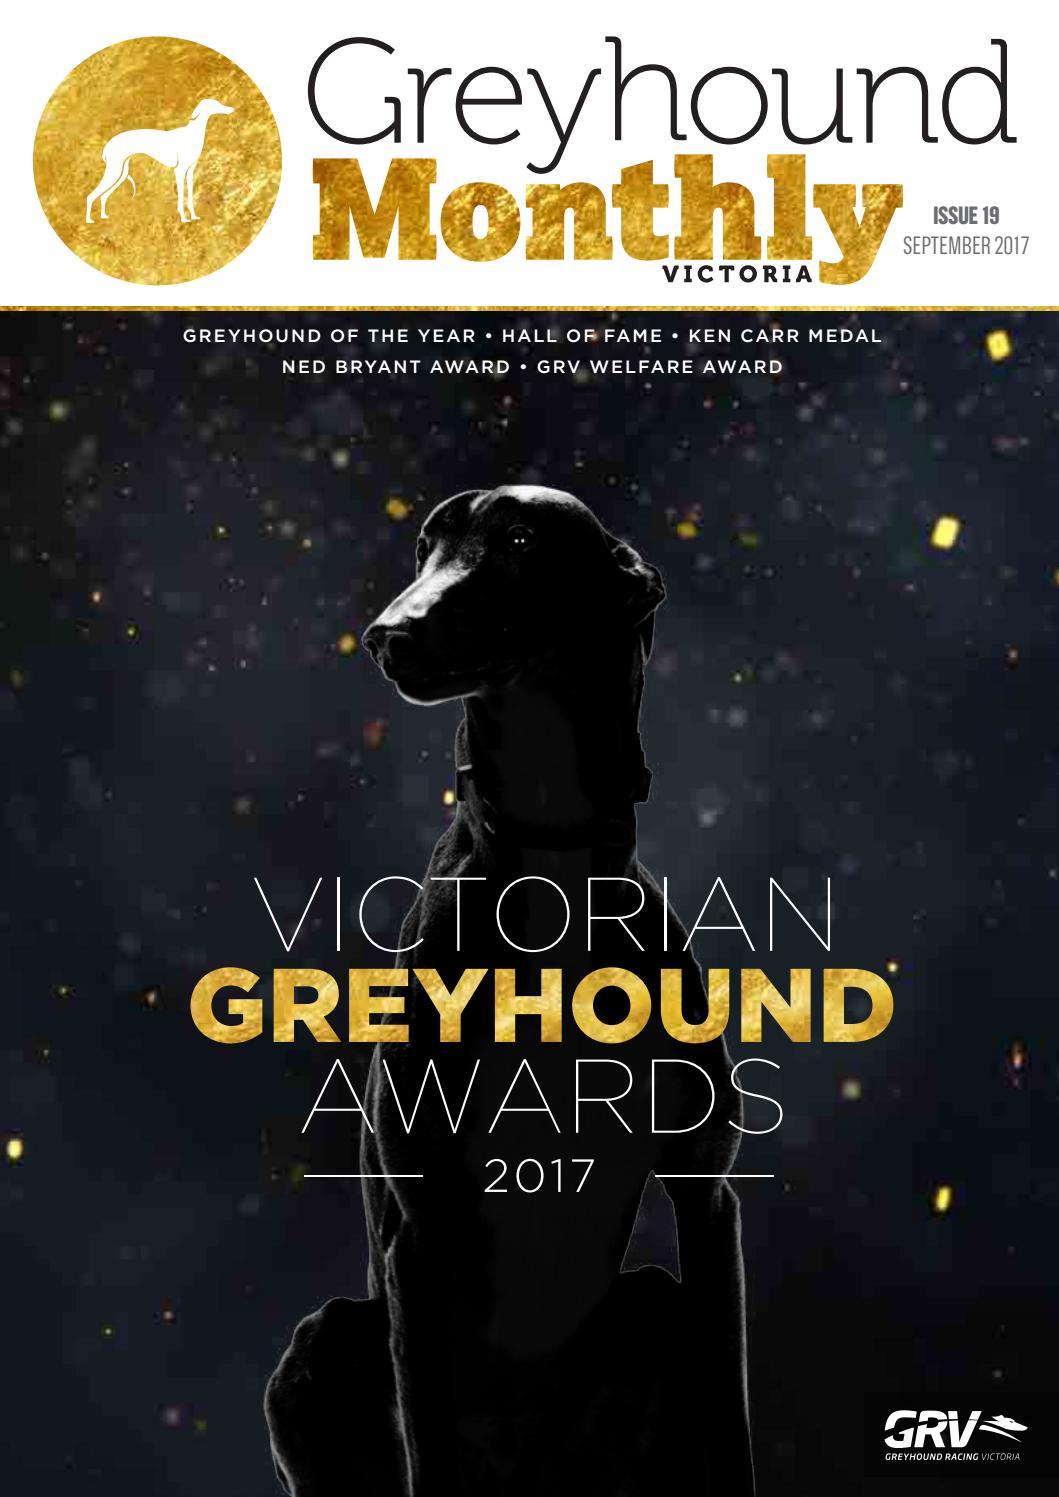 Greyhound Monthly Victoria - Issue 19 by Greyhound Racing